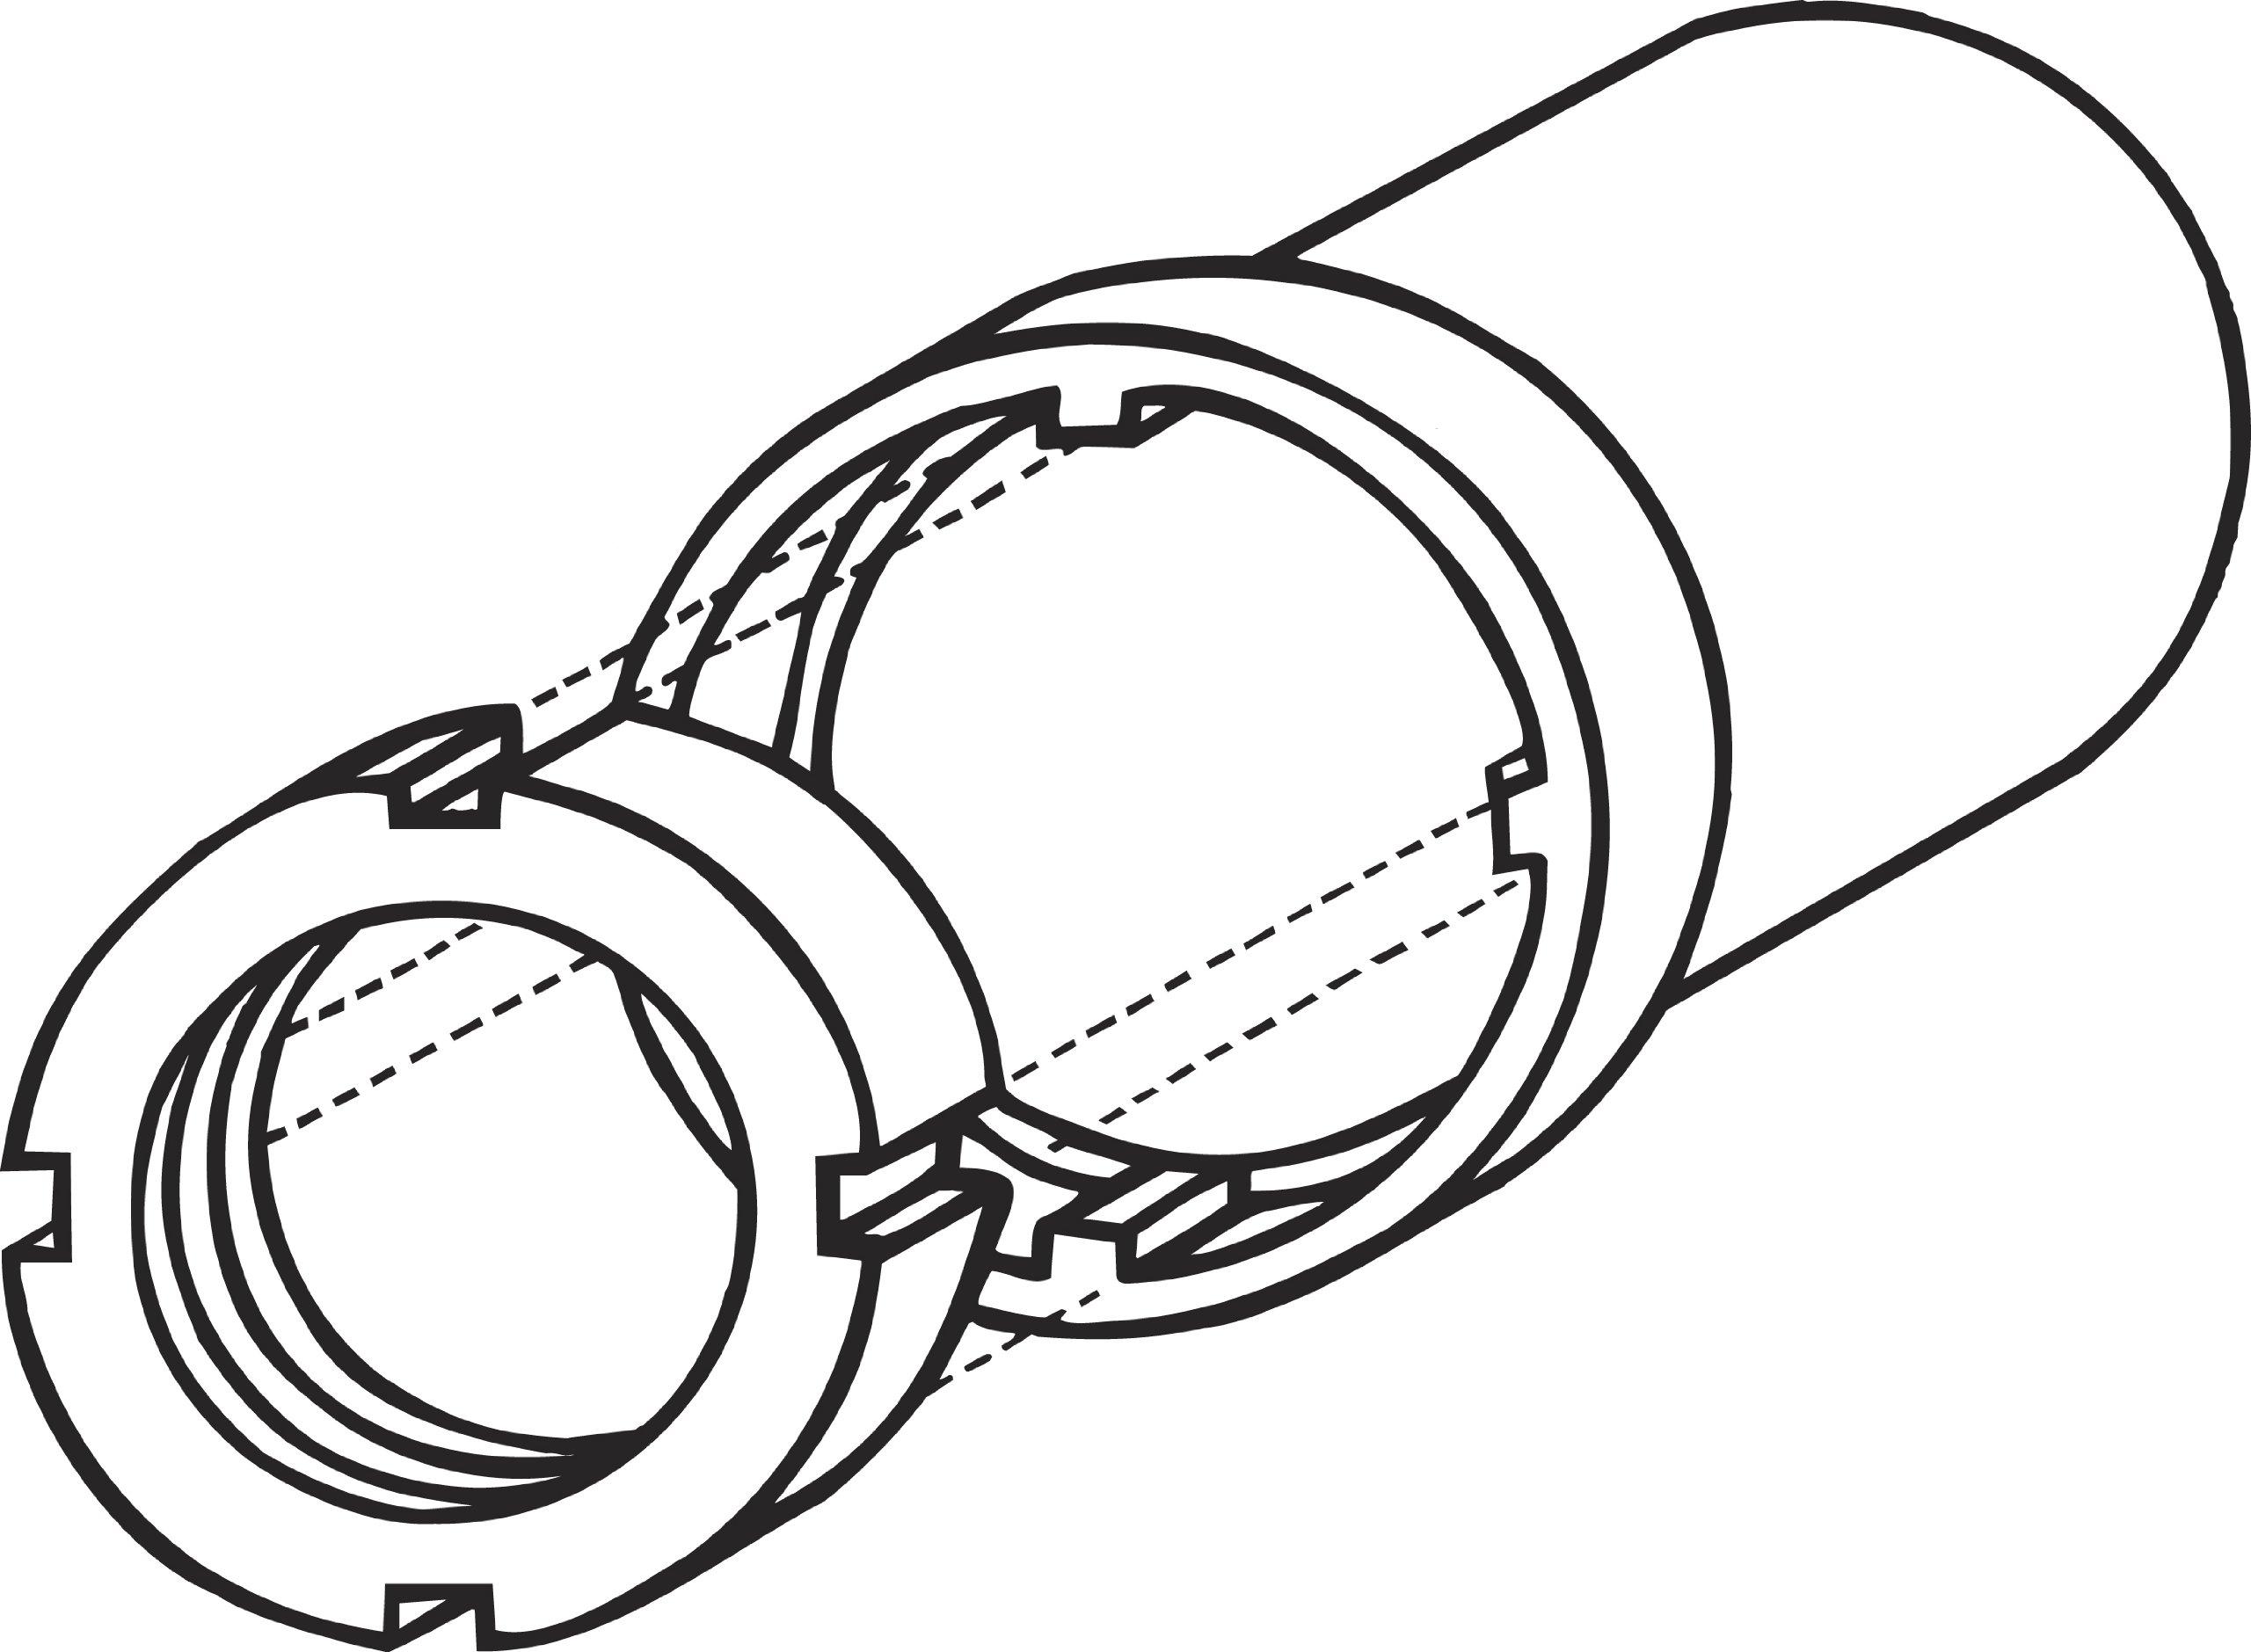 Lisle 29900 4 Wheel Drive Bearing Lock-Nut Tool